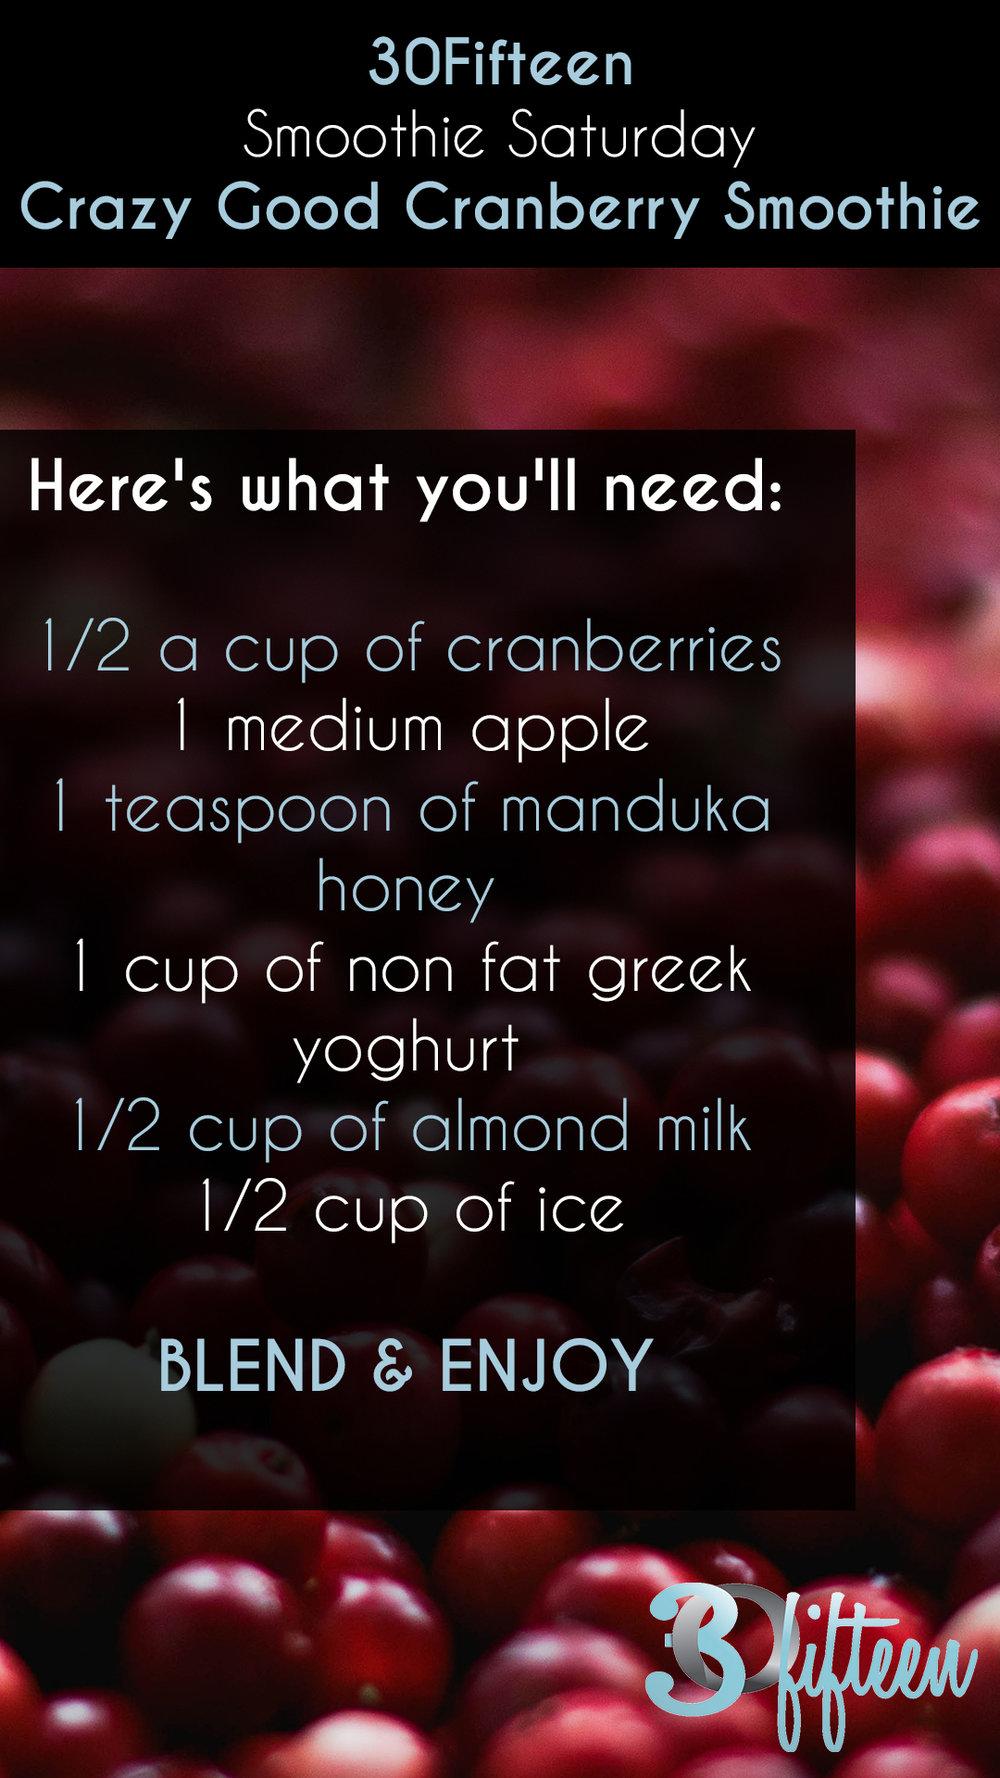 30Fifteen smoothie recipe.jpg